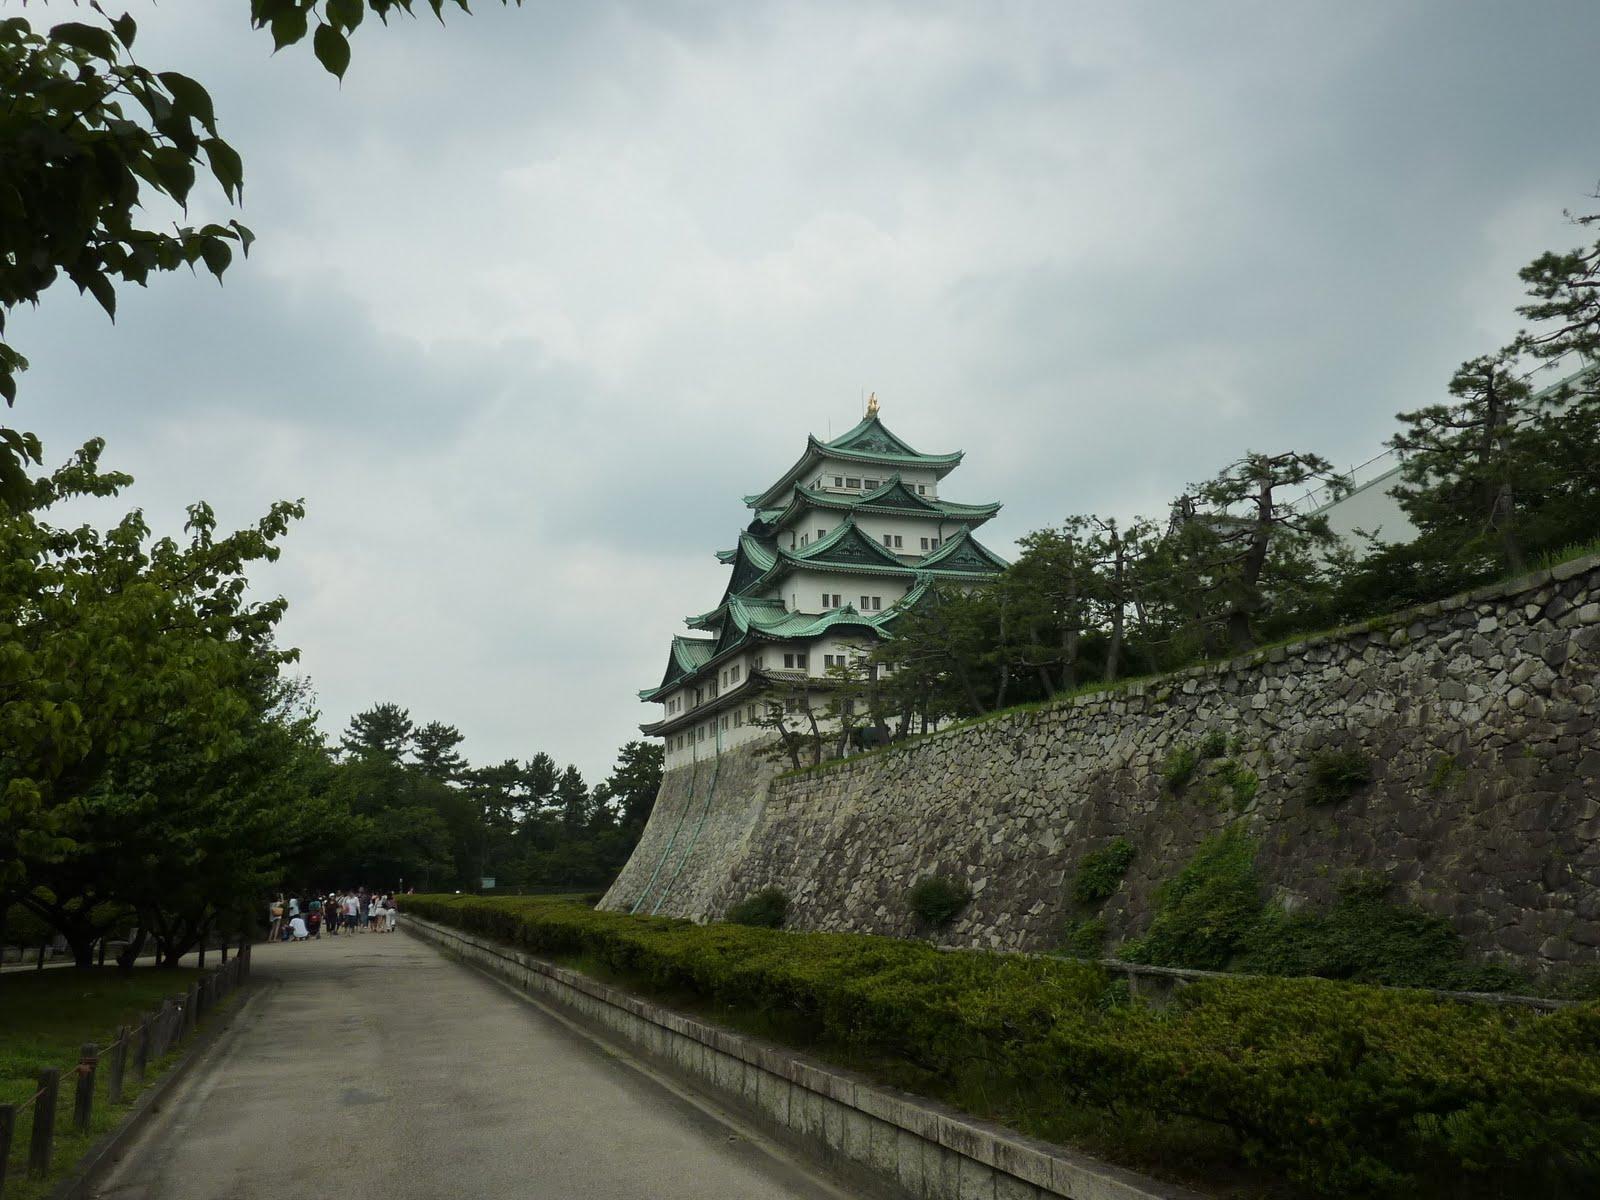 ADAWAK: Nagoya Castle